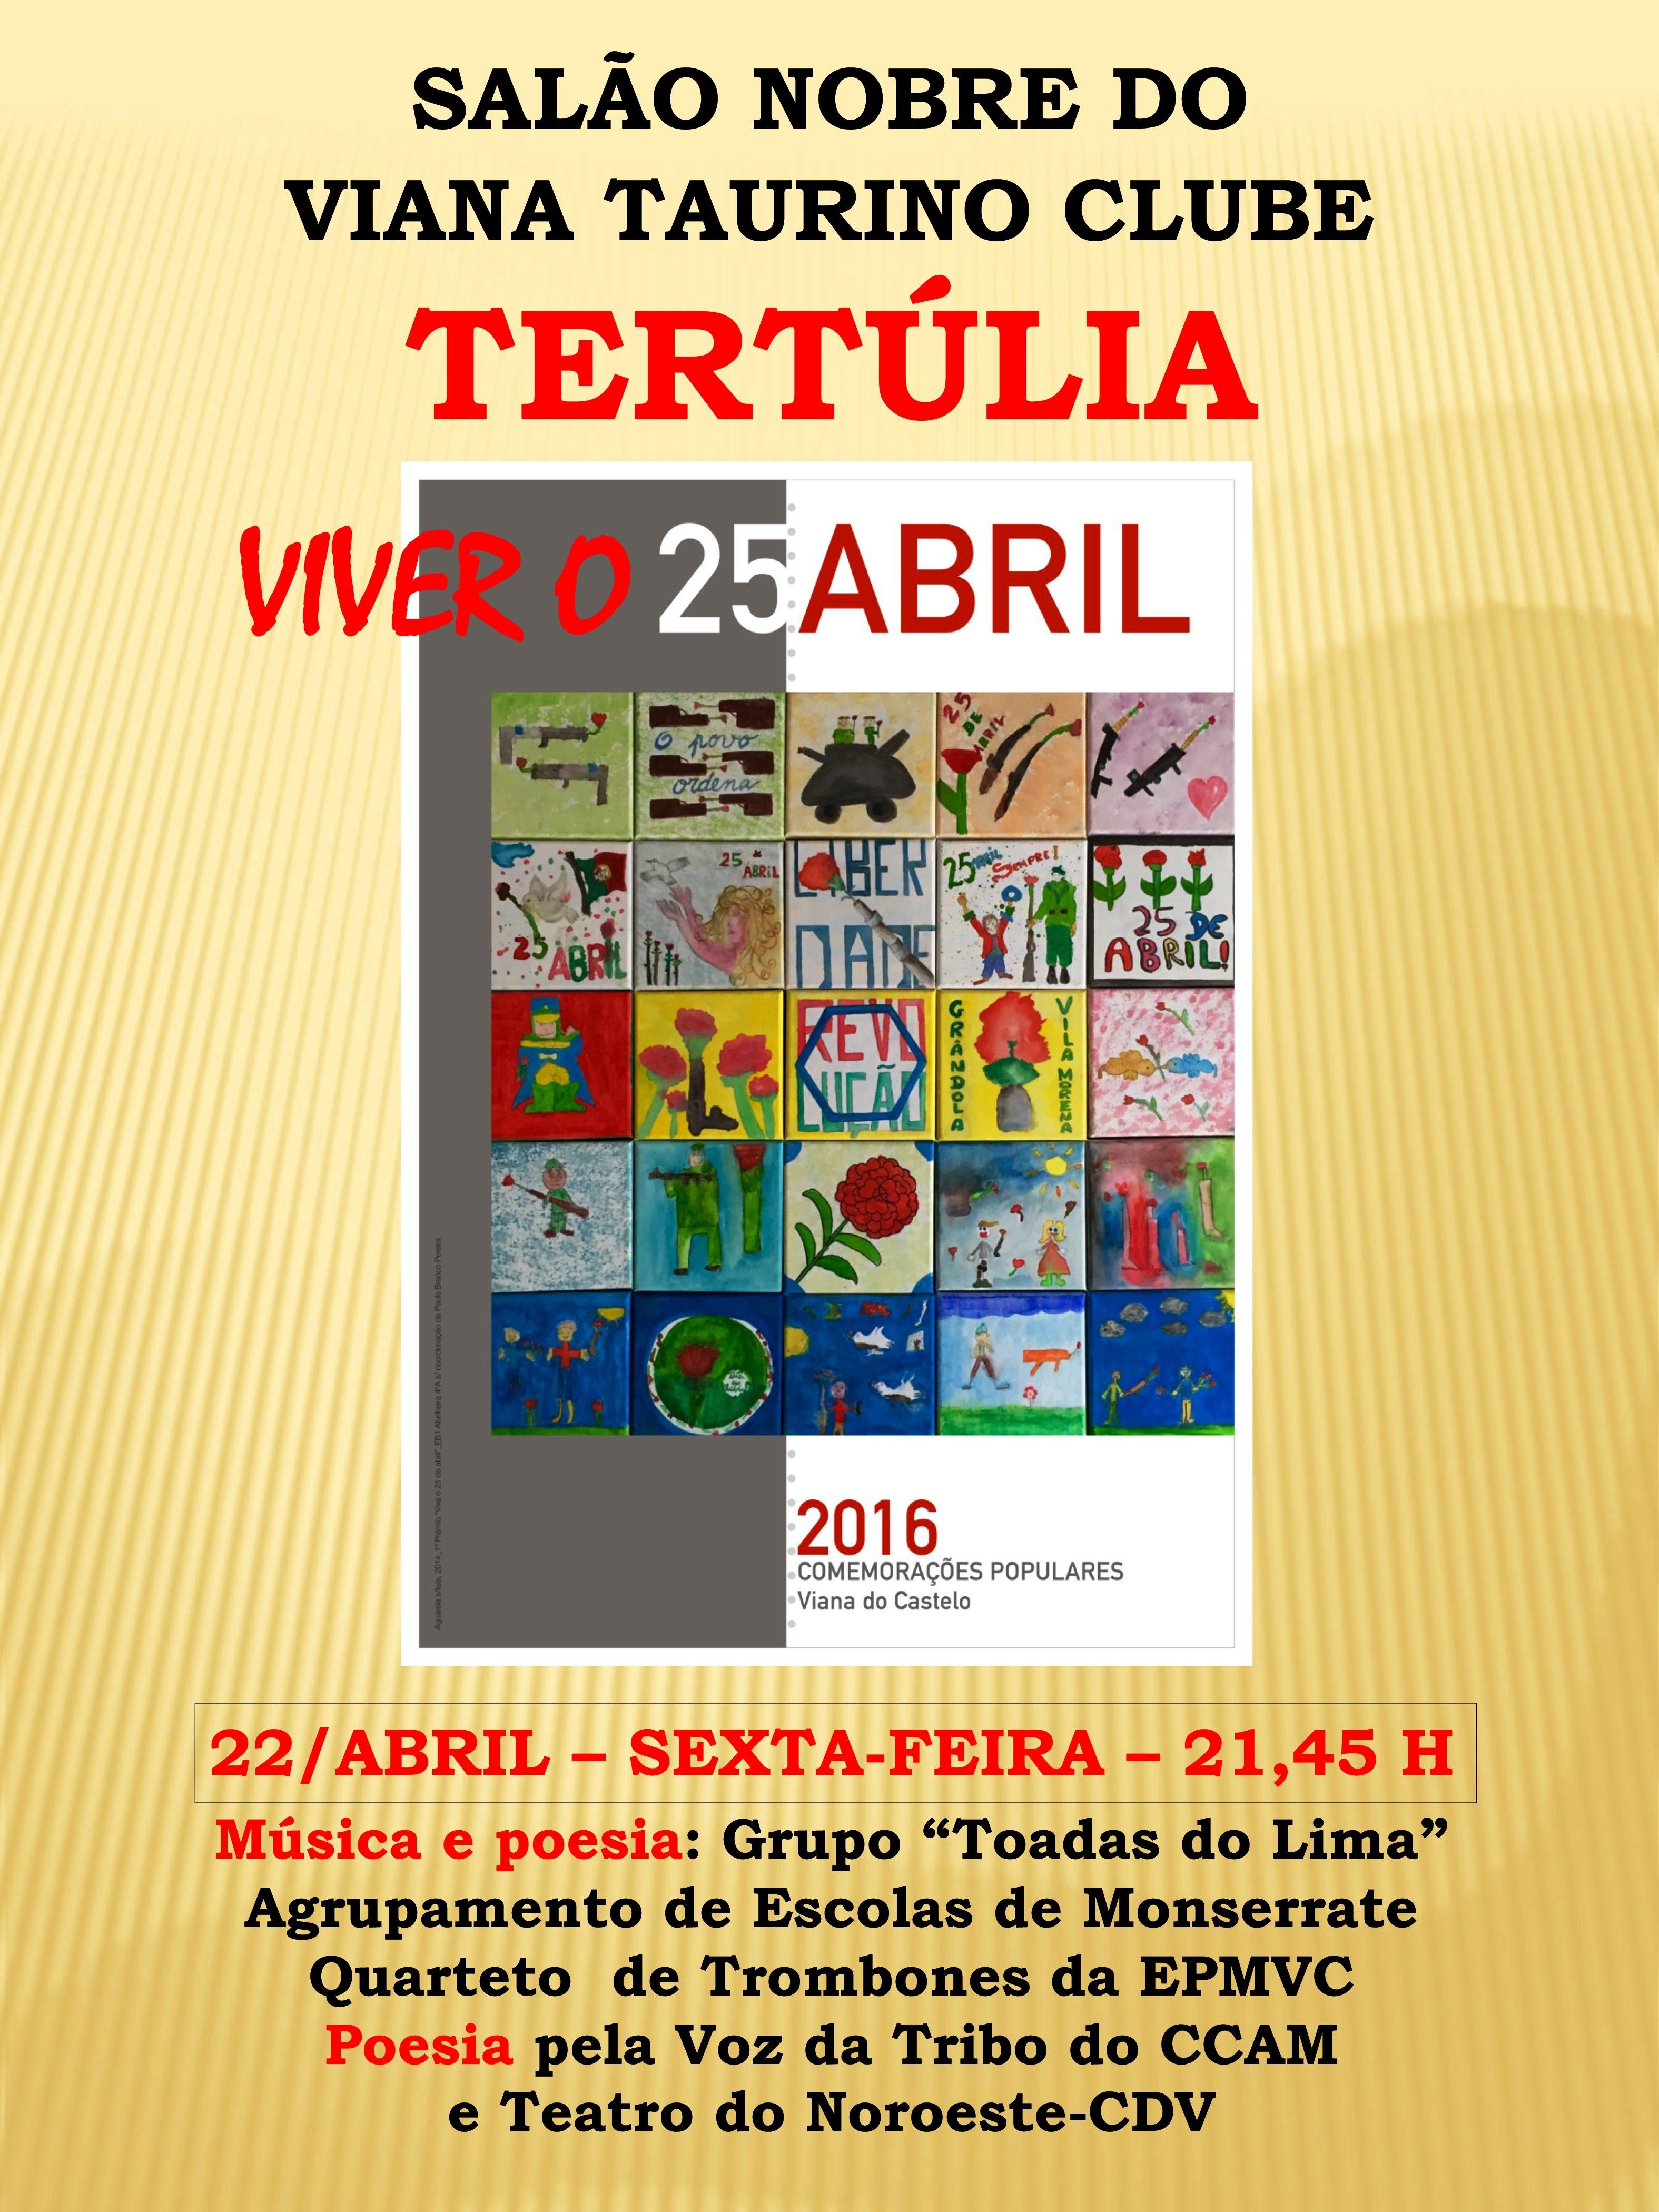 https://sites.google.com/a/centroculturaldoaltominho.org/ccam/actividades-realizadas/2016/realizacoes-actividades/_draft_post/Cartaz_Tert%C3%BAlia.jpg